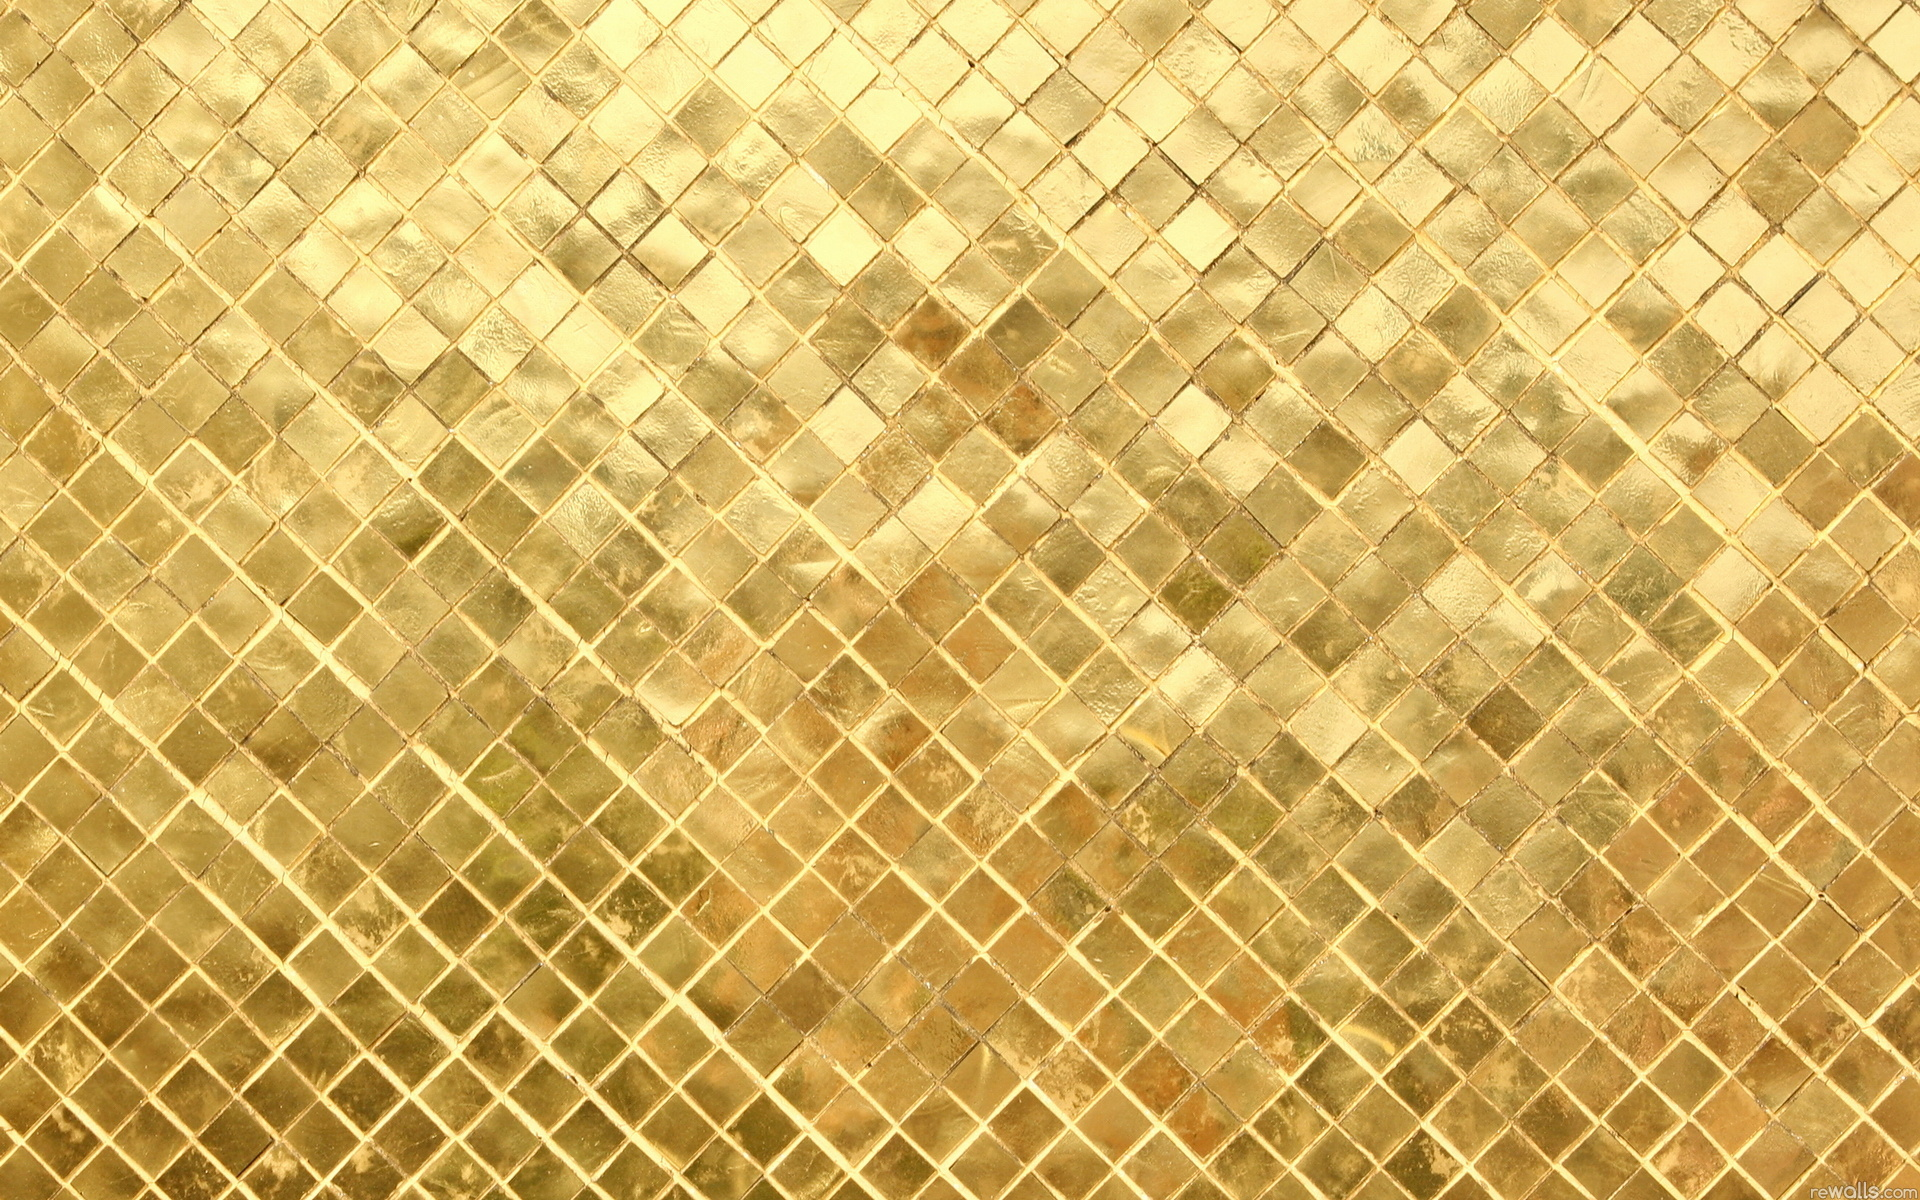 Gold Texture Wallpapers | WallpapersIn4k net